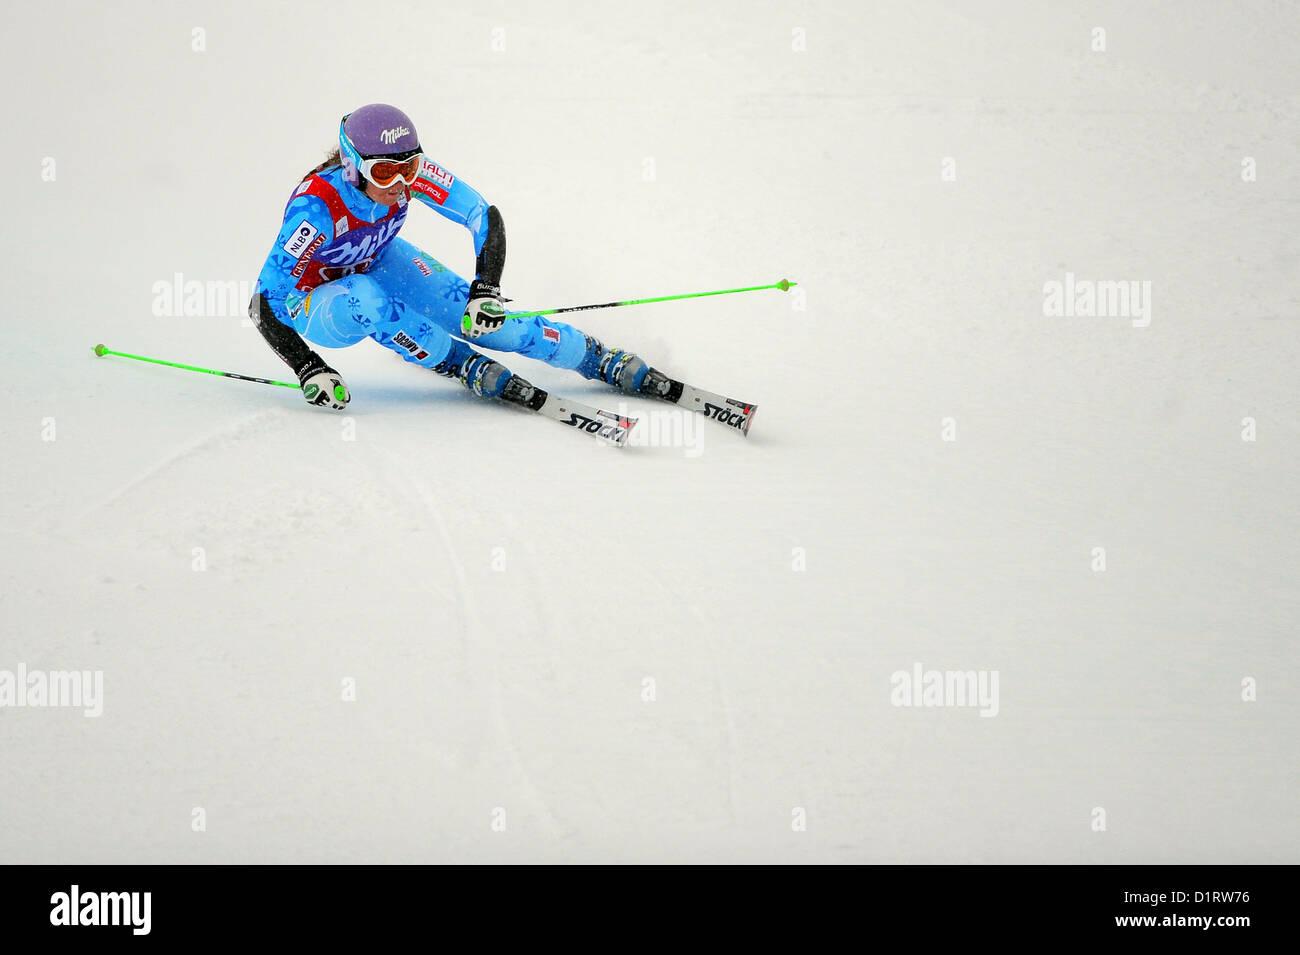 Audi FIS World Cup, Ladies Giant Slalom, Courchevel, France, 16.12.12. Winner -  Tina Maze of Slovenia. - Stock Image